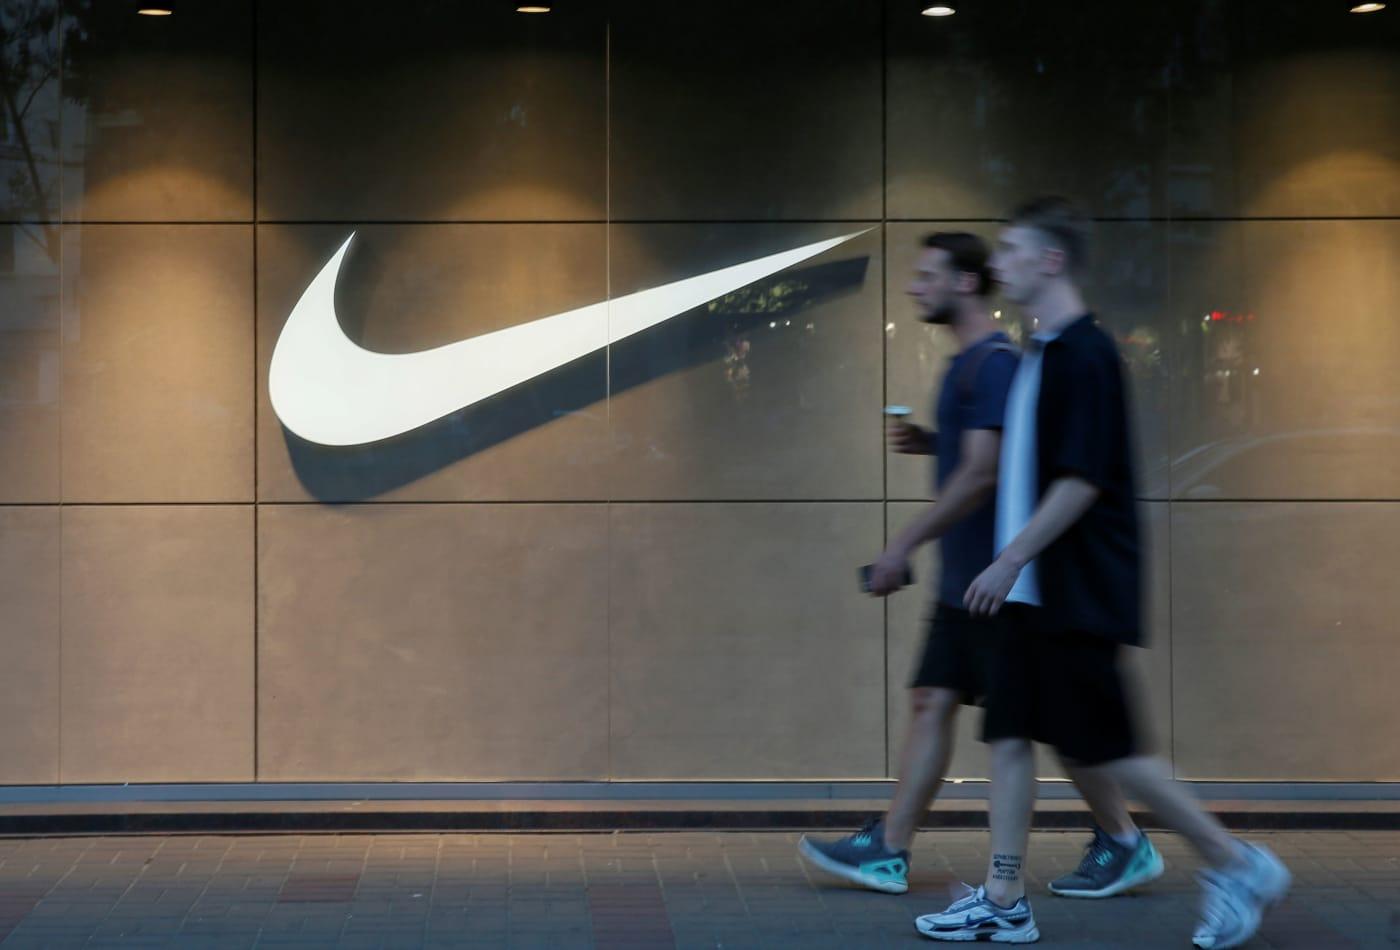 Nike criticized for selling 'menacing' $92 balaclava